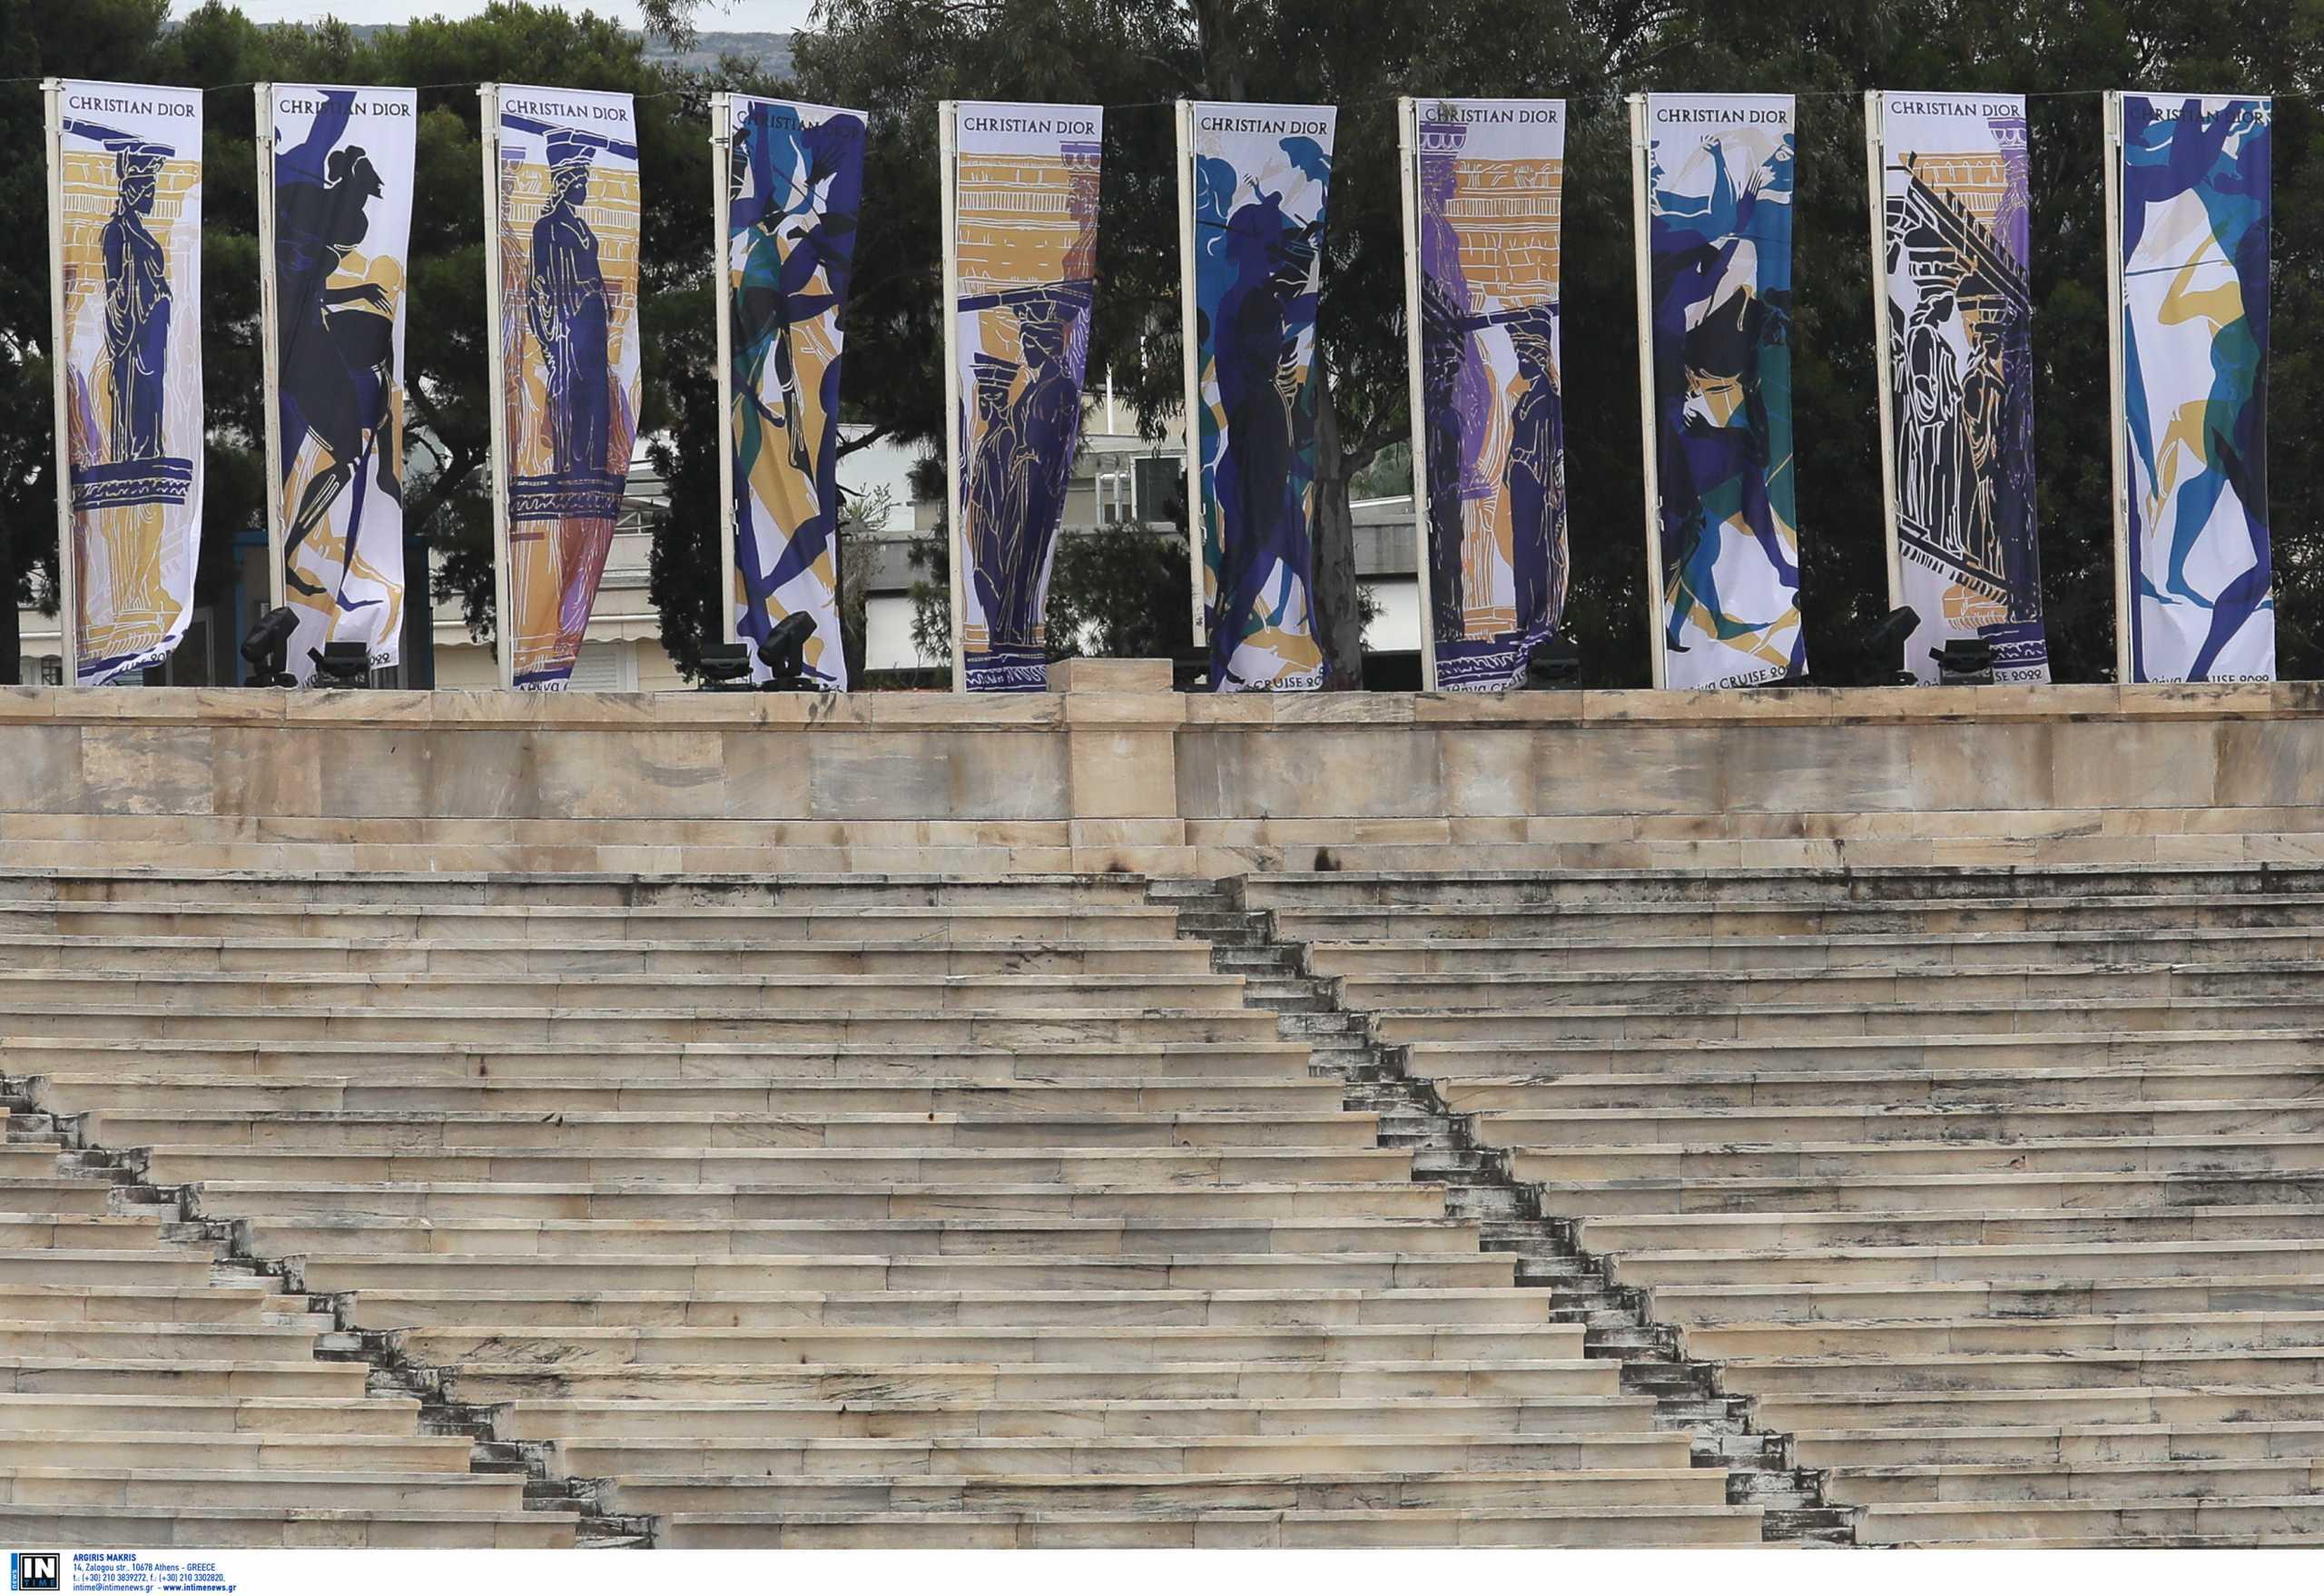 Phos και Kallos στην επίδειξη του Dior στο Καλλιμάρμαρο – Όλα όσα θα γίνουν